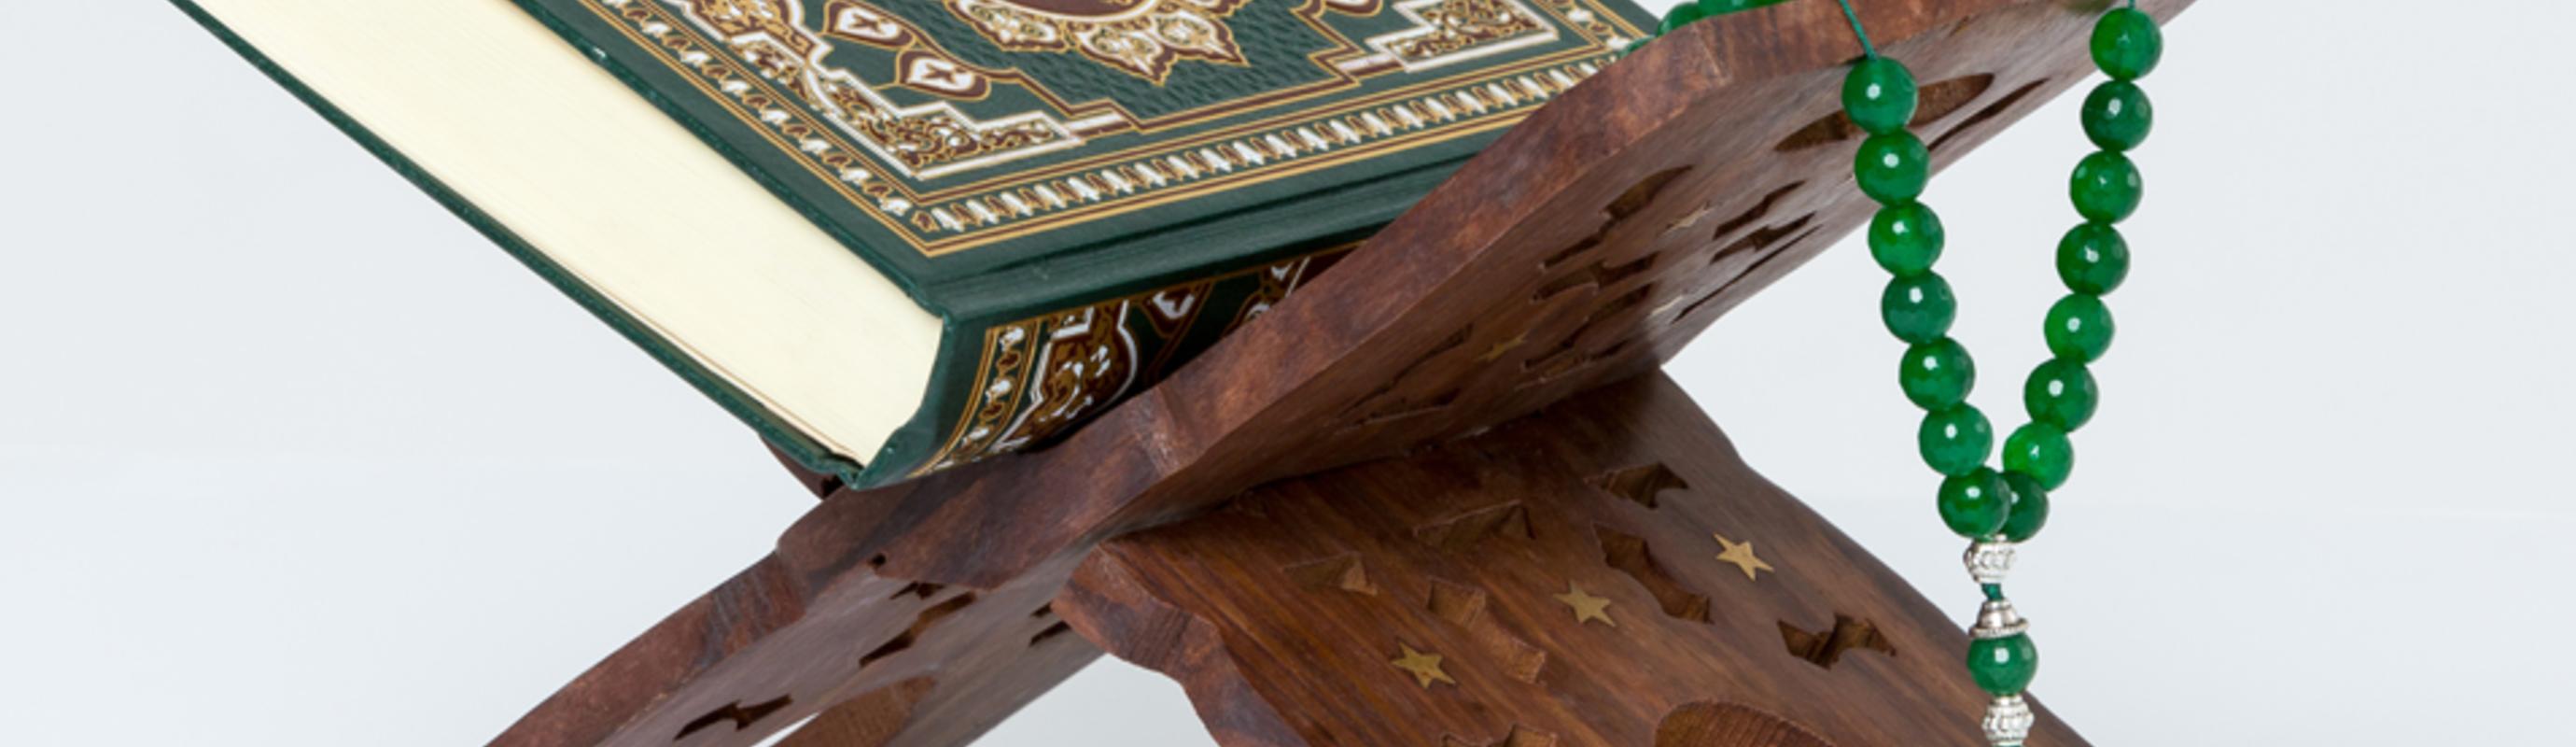 Tafsir series - daily Ramadhan prayers,- (Farsi).